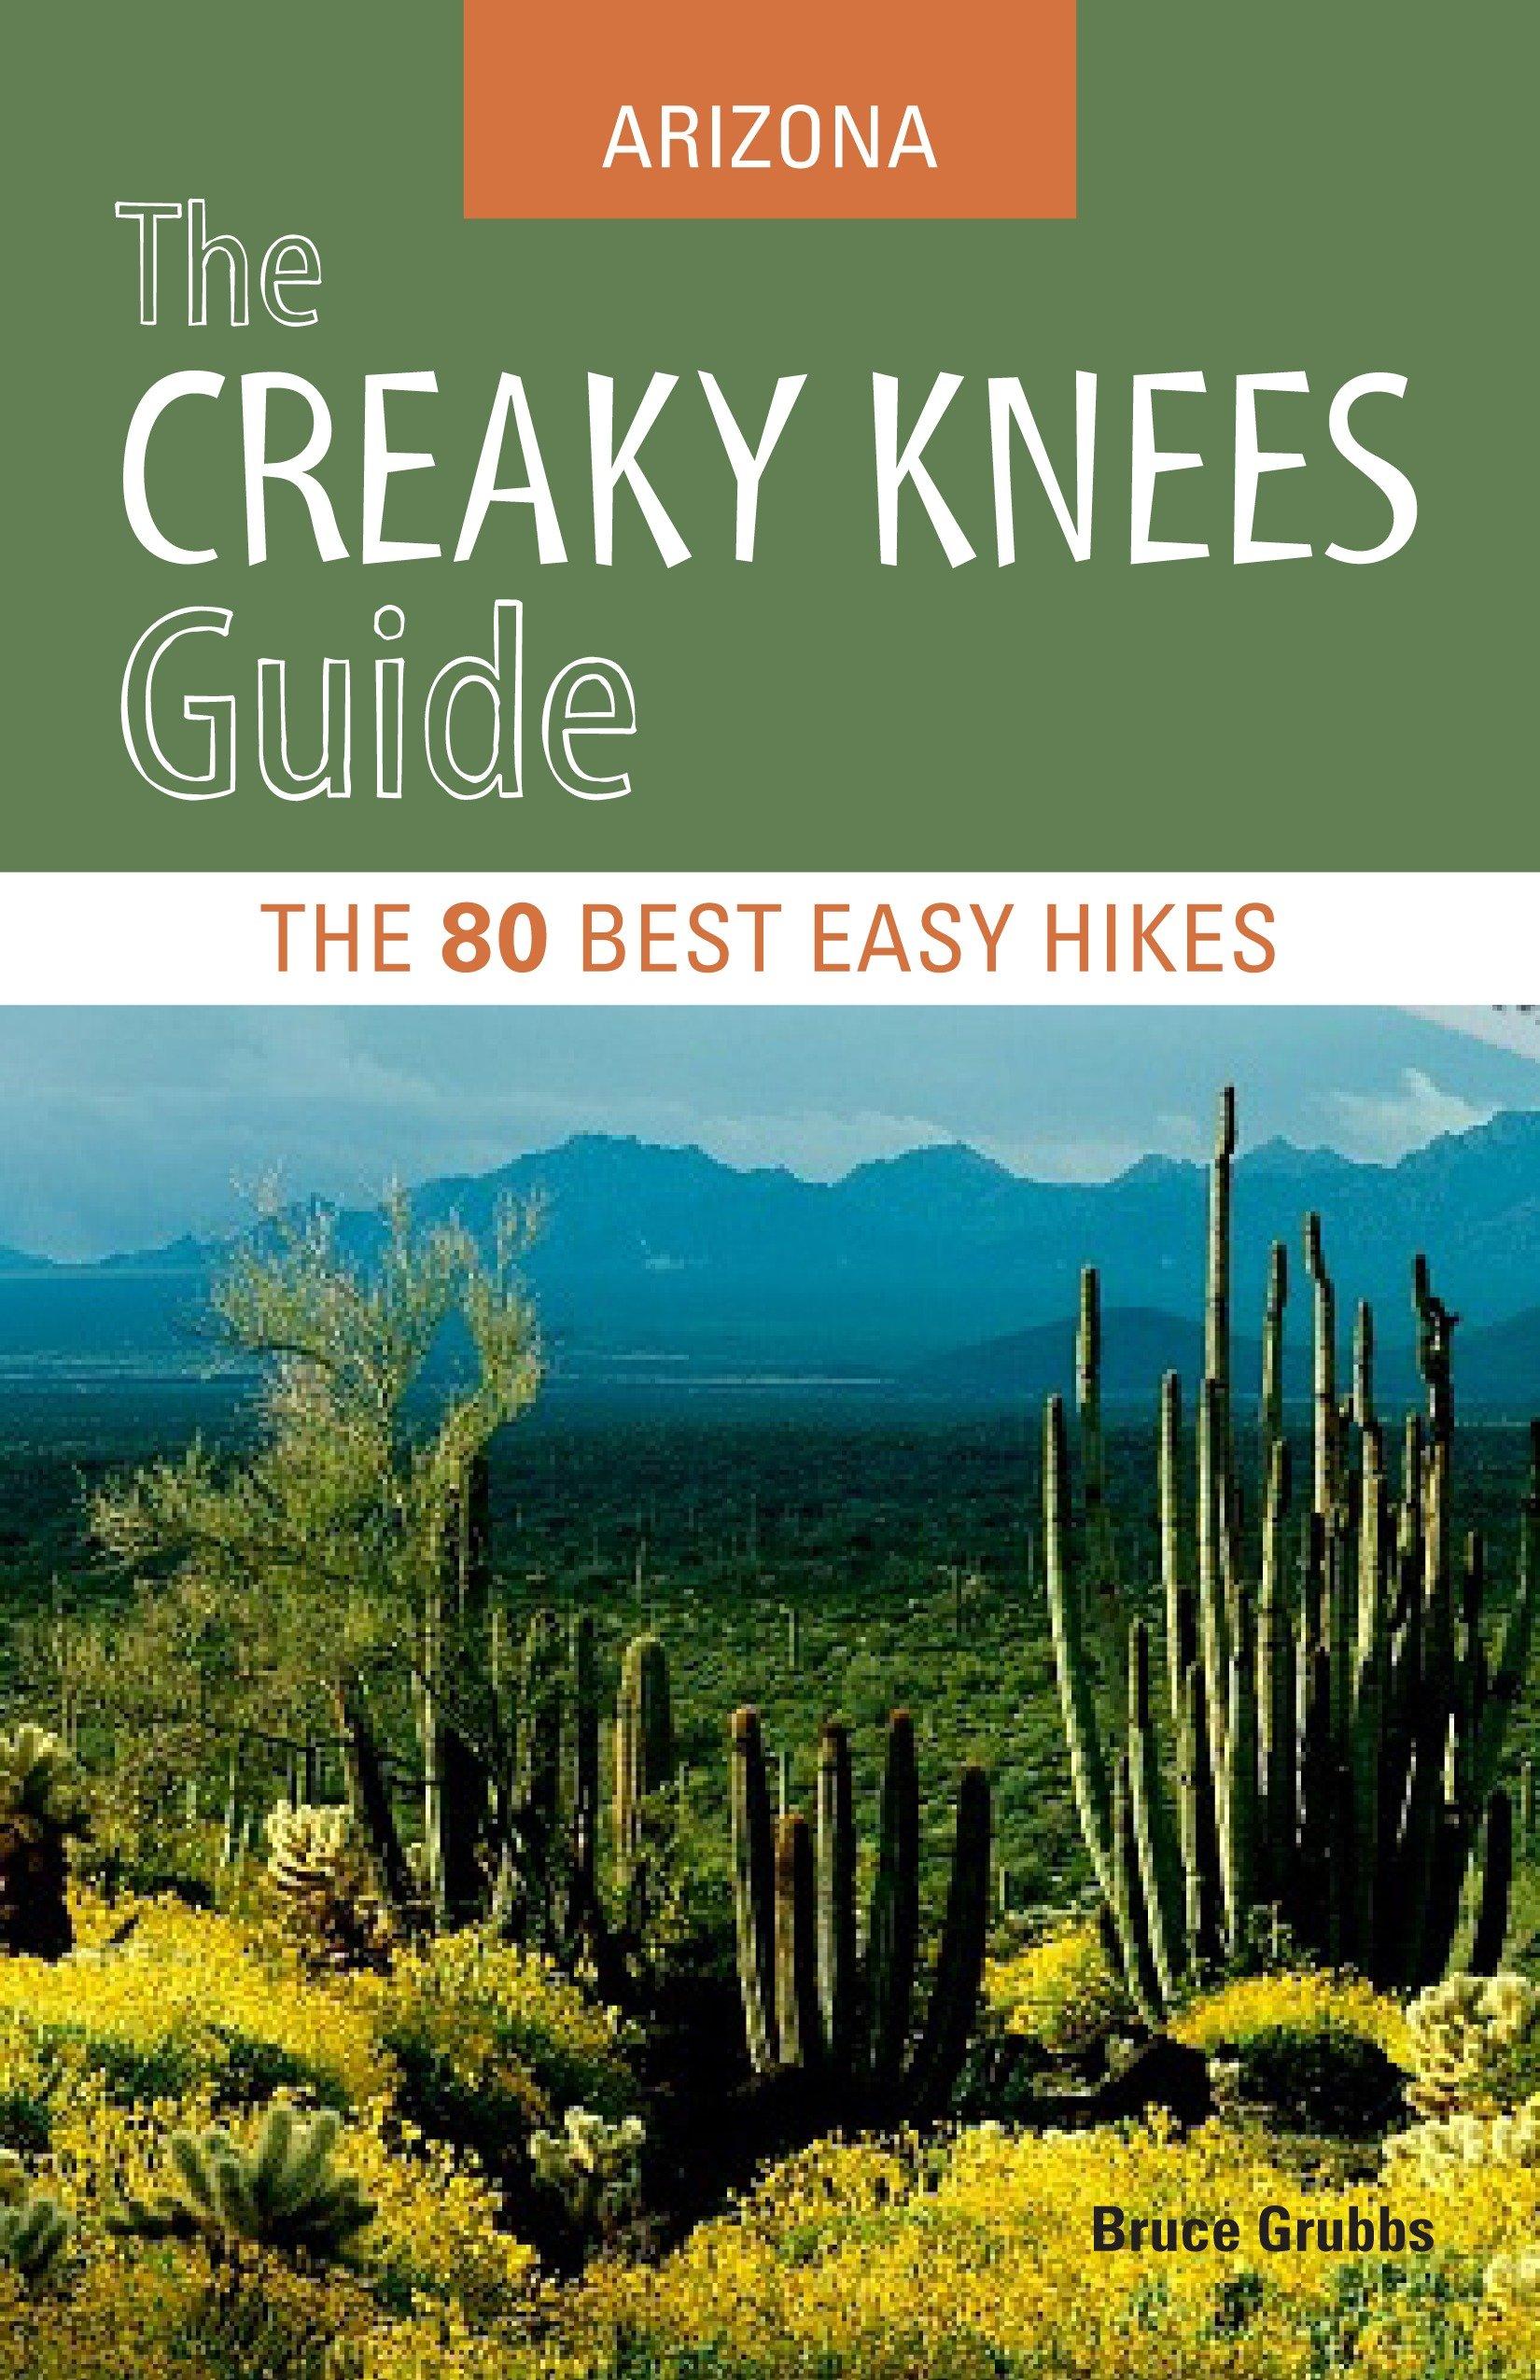 The creaky knees guide Arizona the 80 best easy hikes